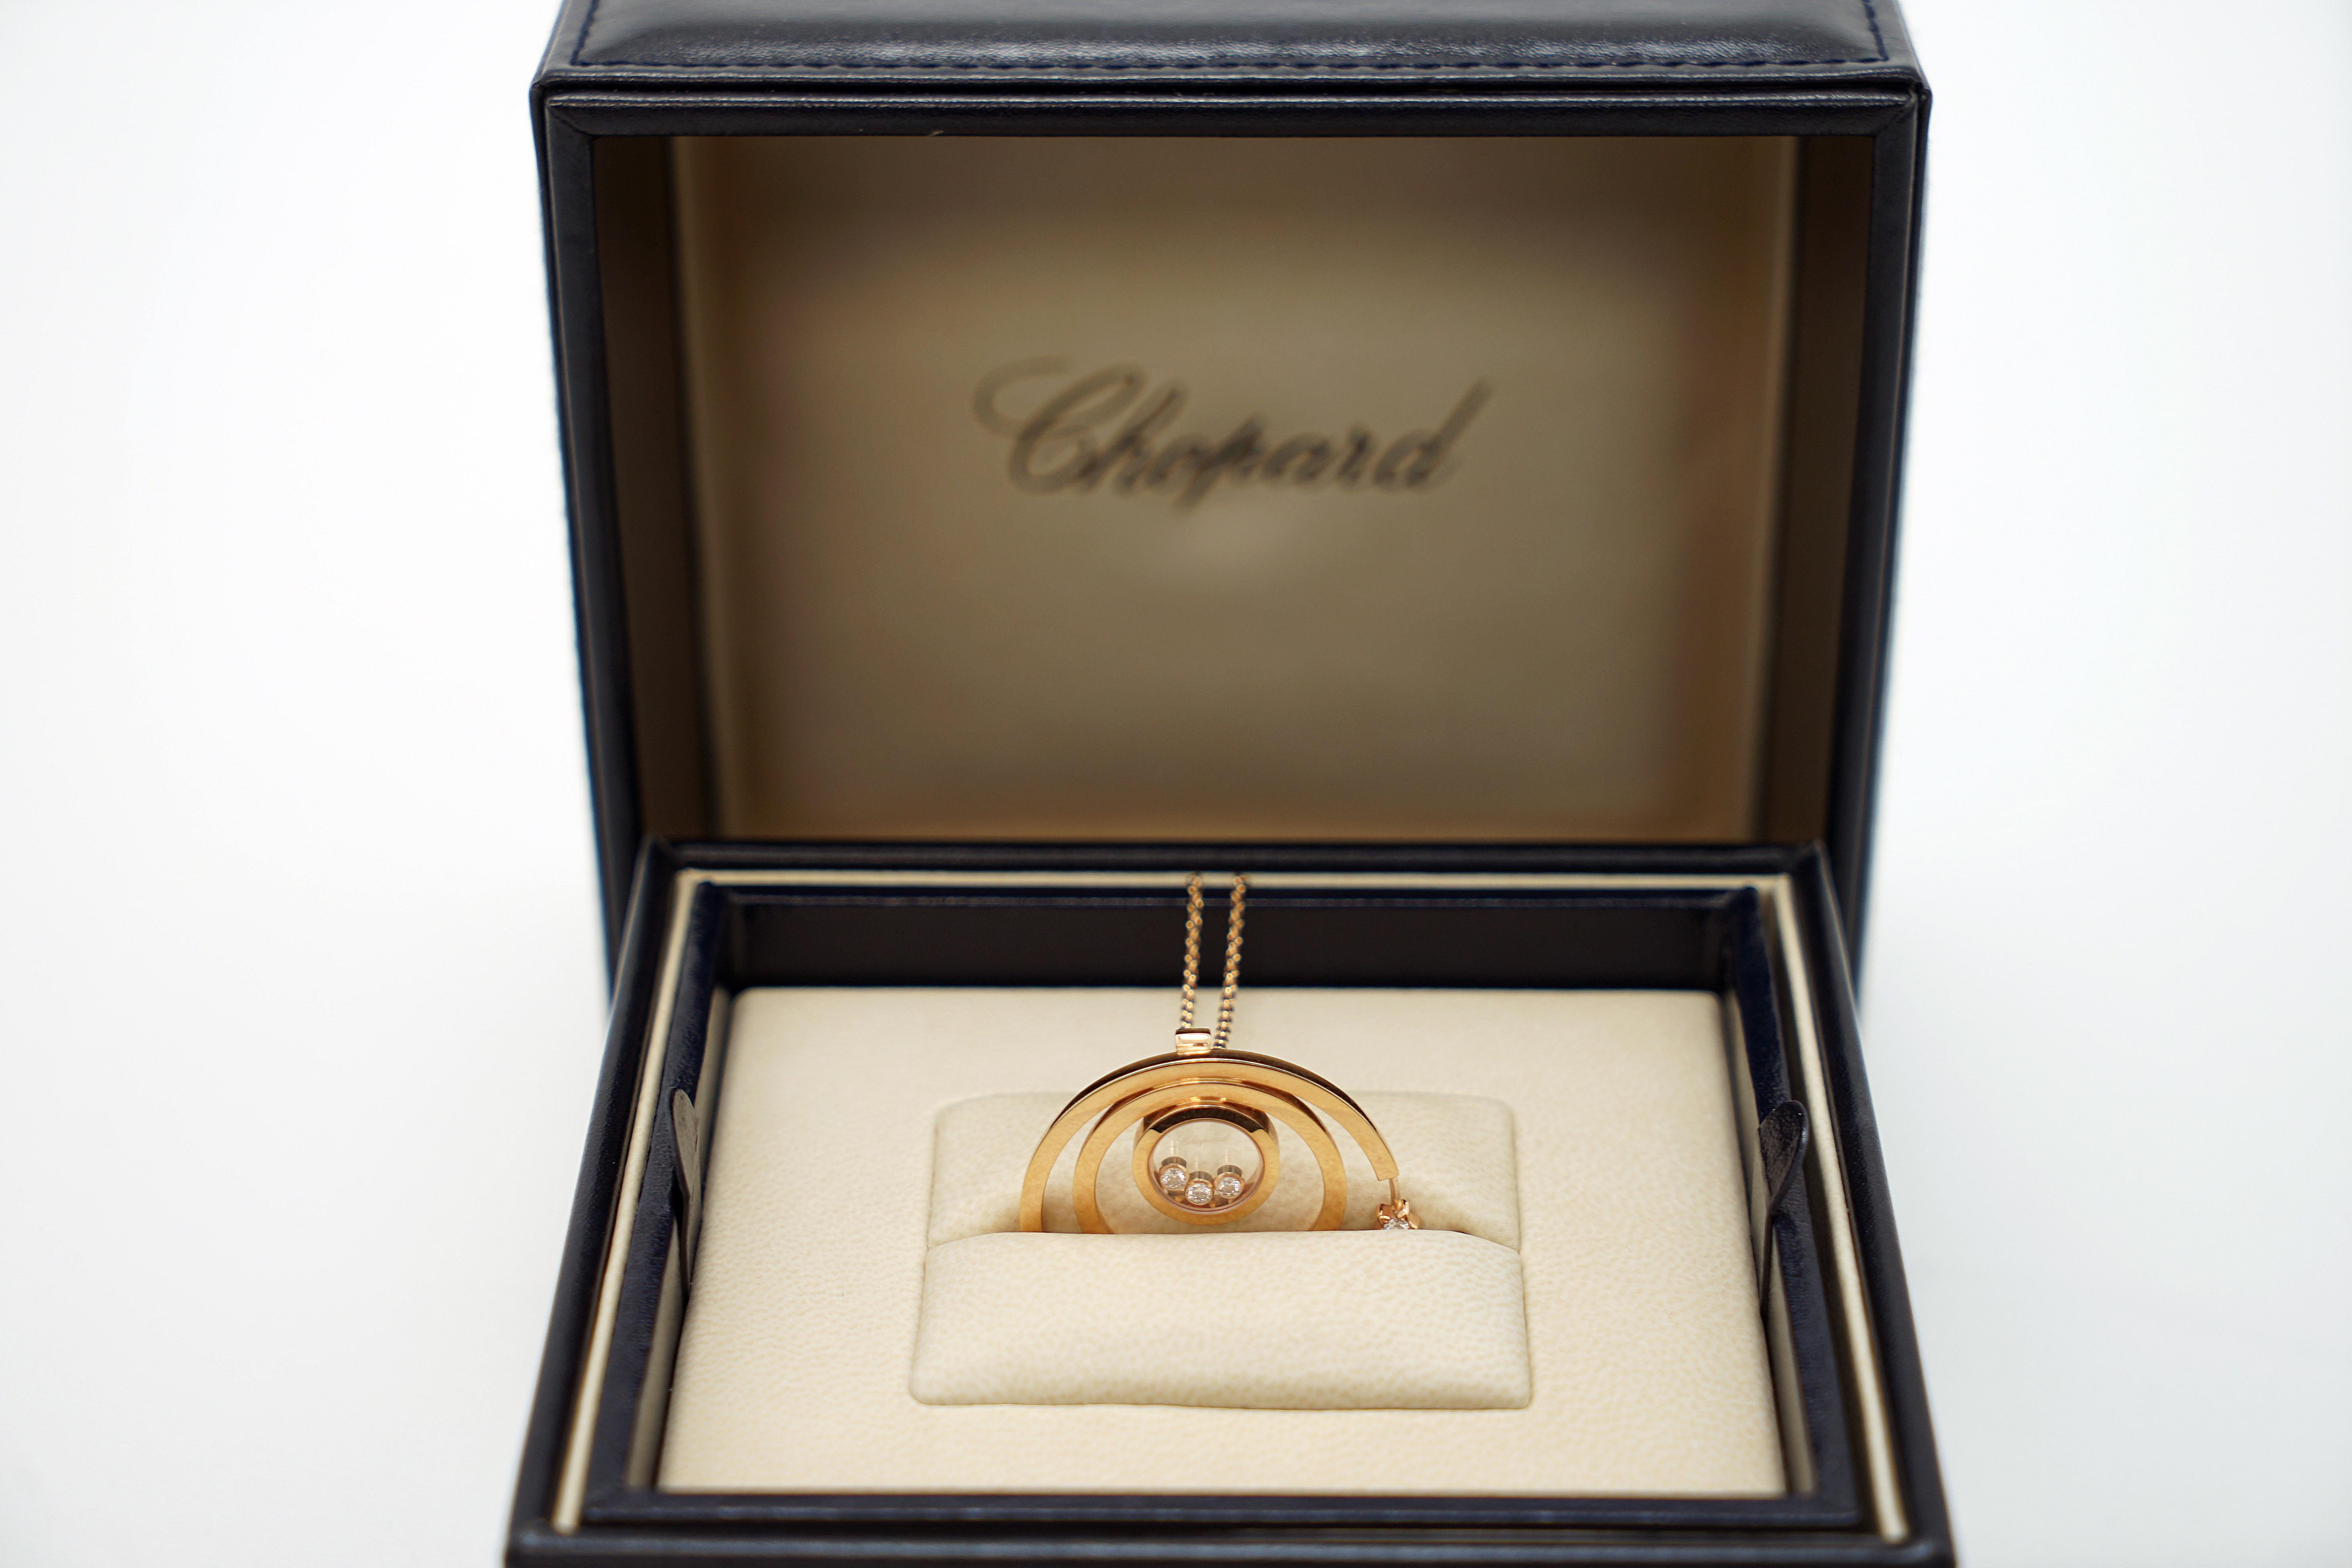 A Lady's Chopard 18K Rose Gold , Happy Diamonds pendant - Image 3 of 9